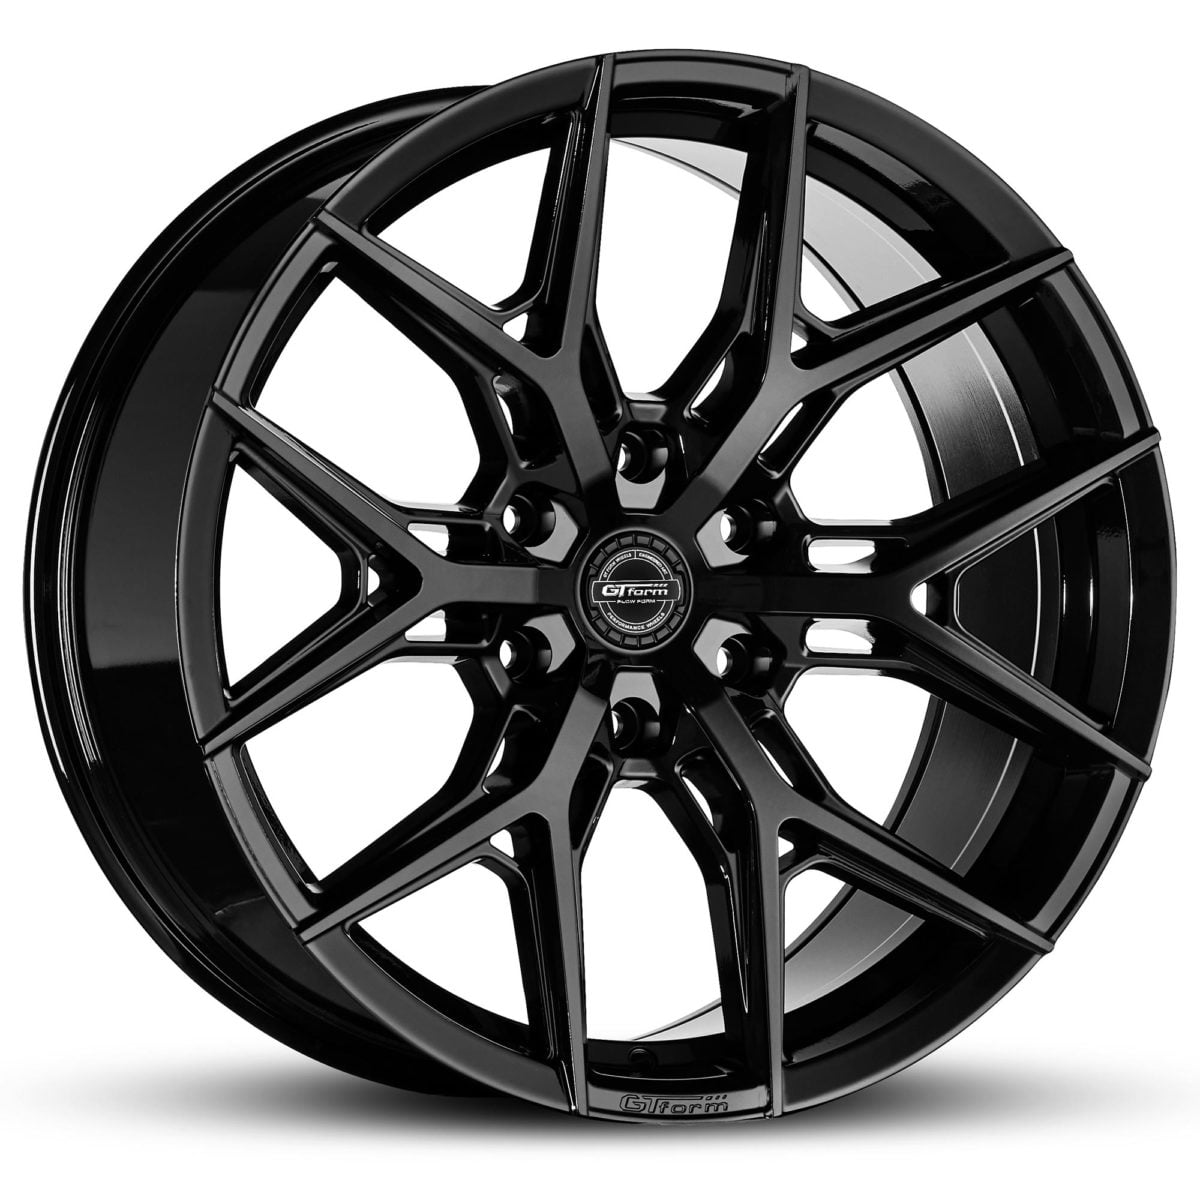 4x4 Wheels GT Form GF-S1 Gloss Black Wheels 6x139.7 rims